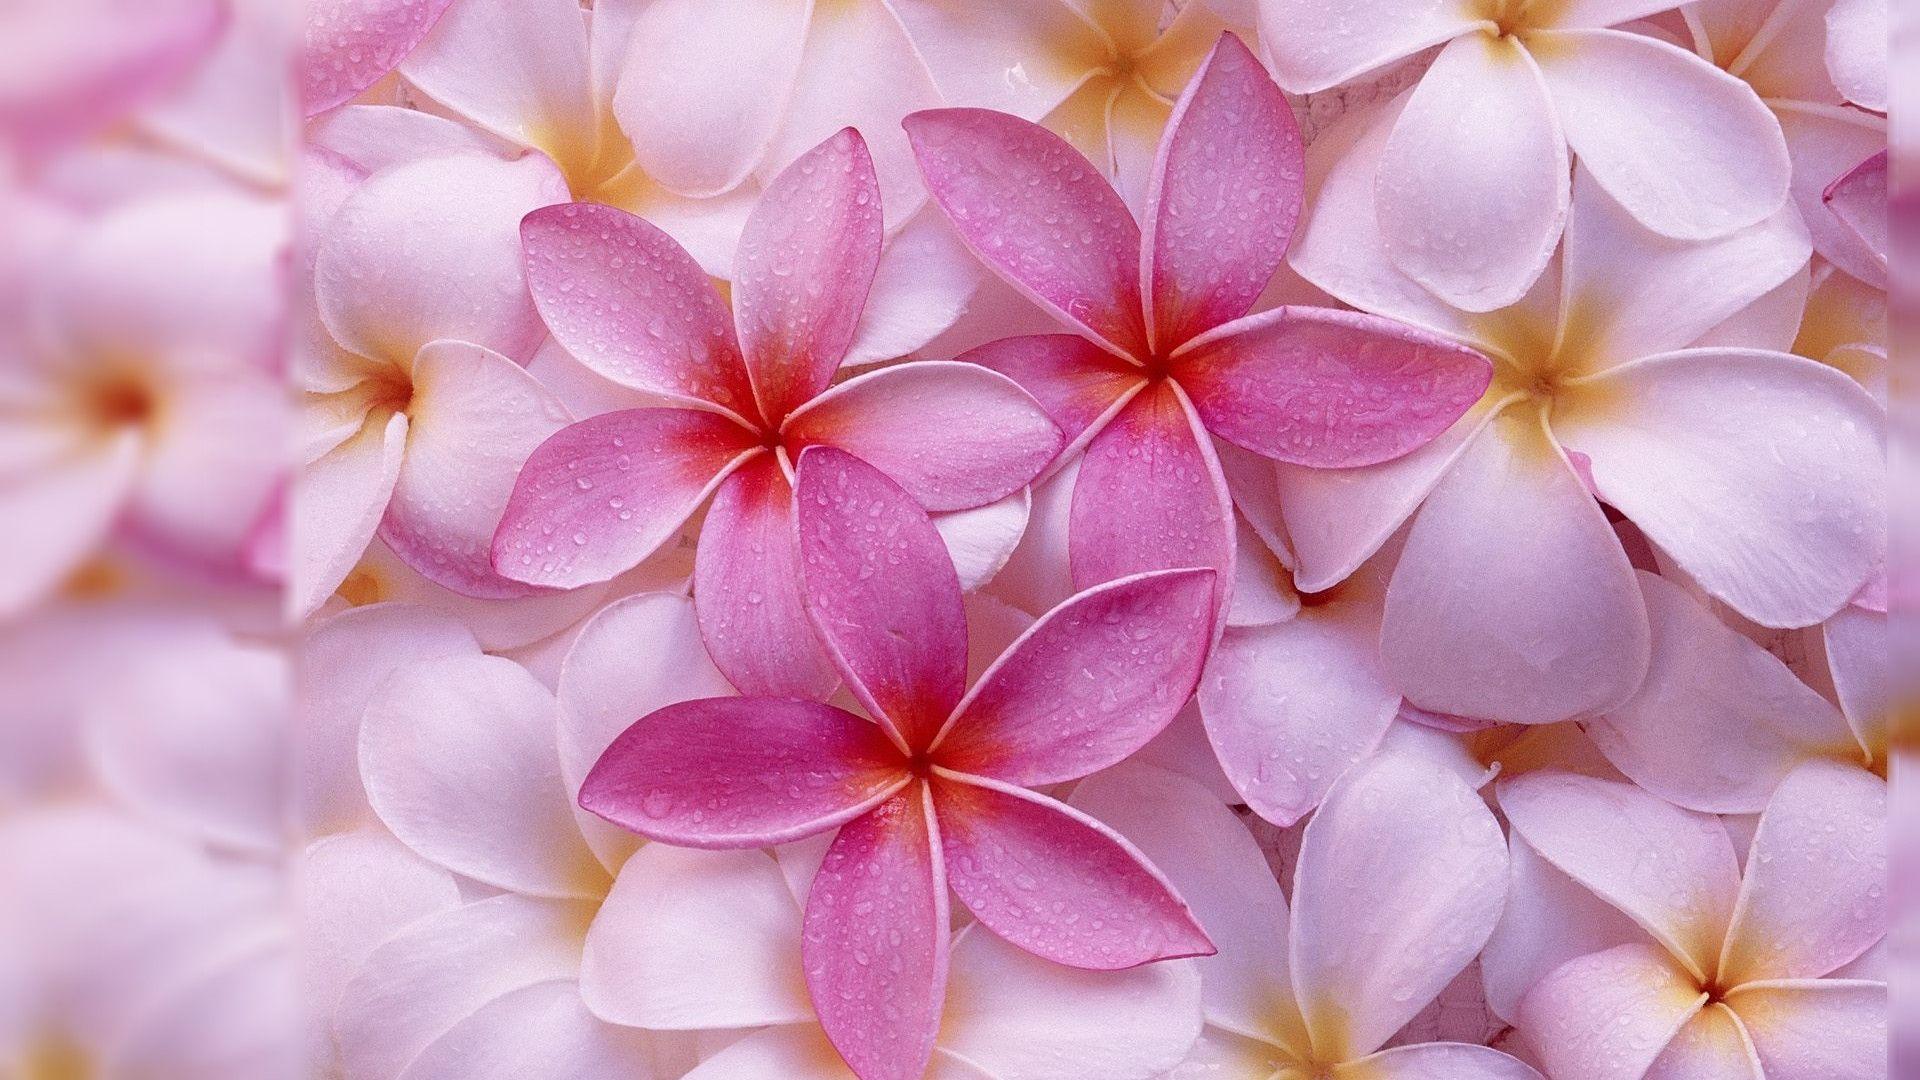 Pink Jasmine Flower - Beautiful Love Wallpaper For Desktop , HD Wallpaper & Backgrounds